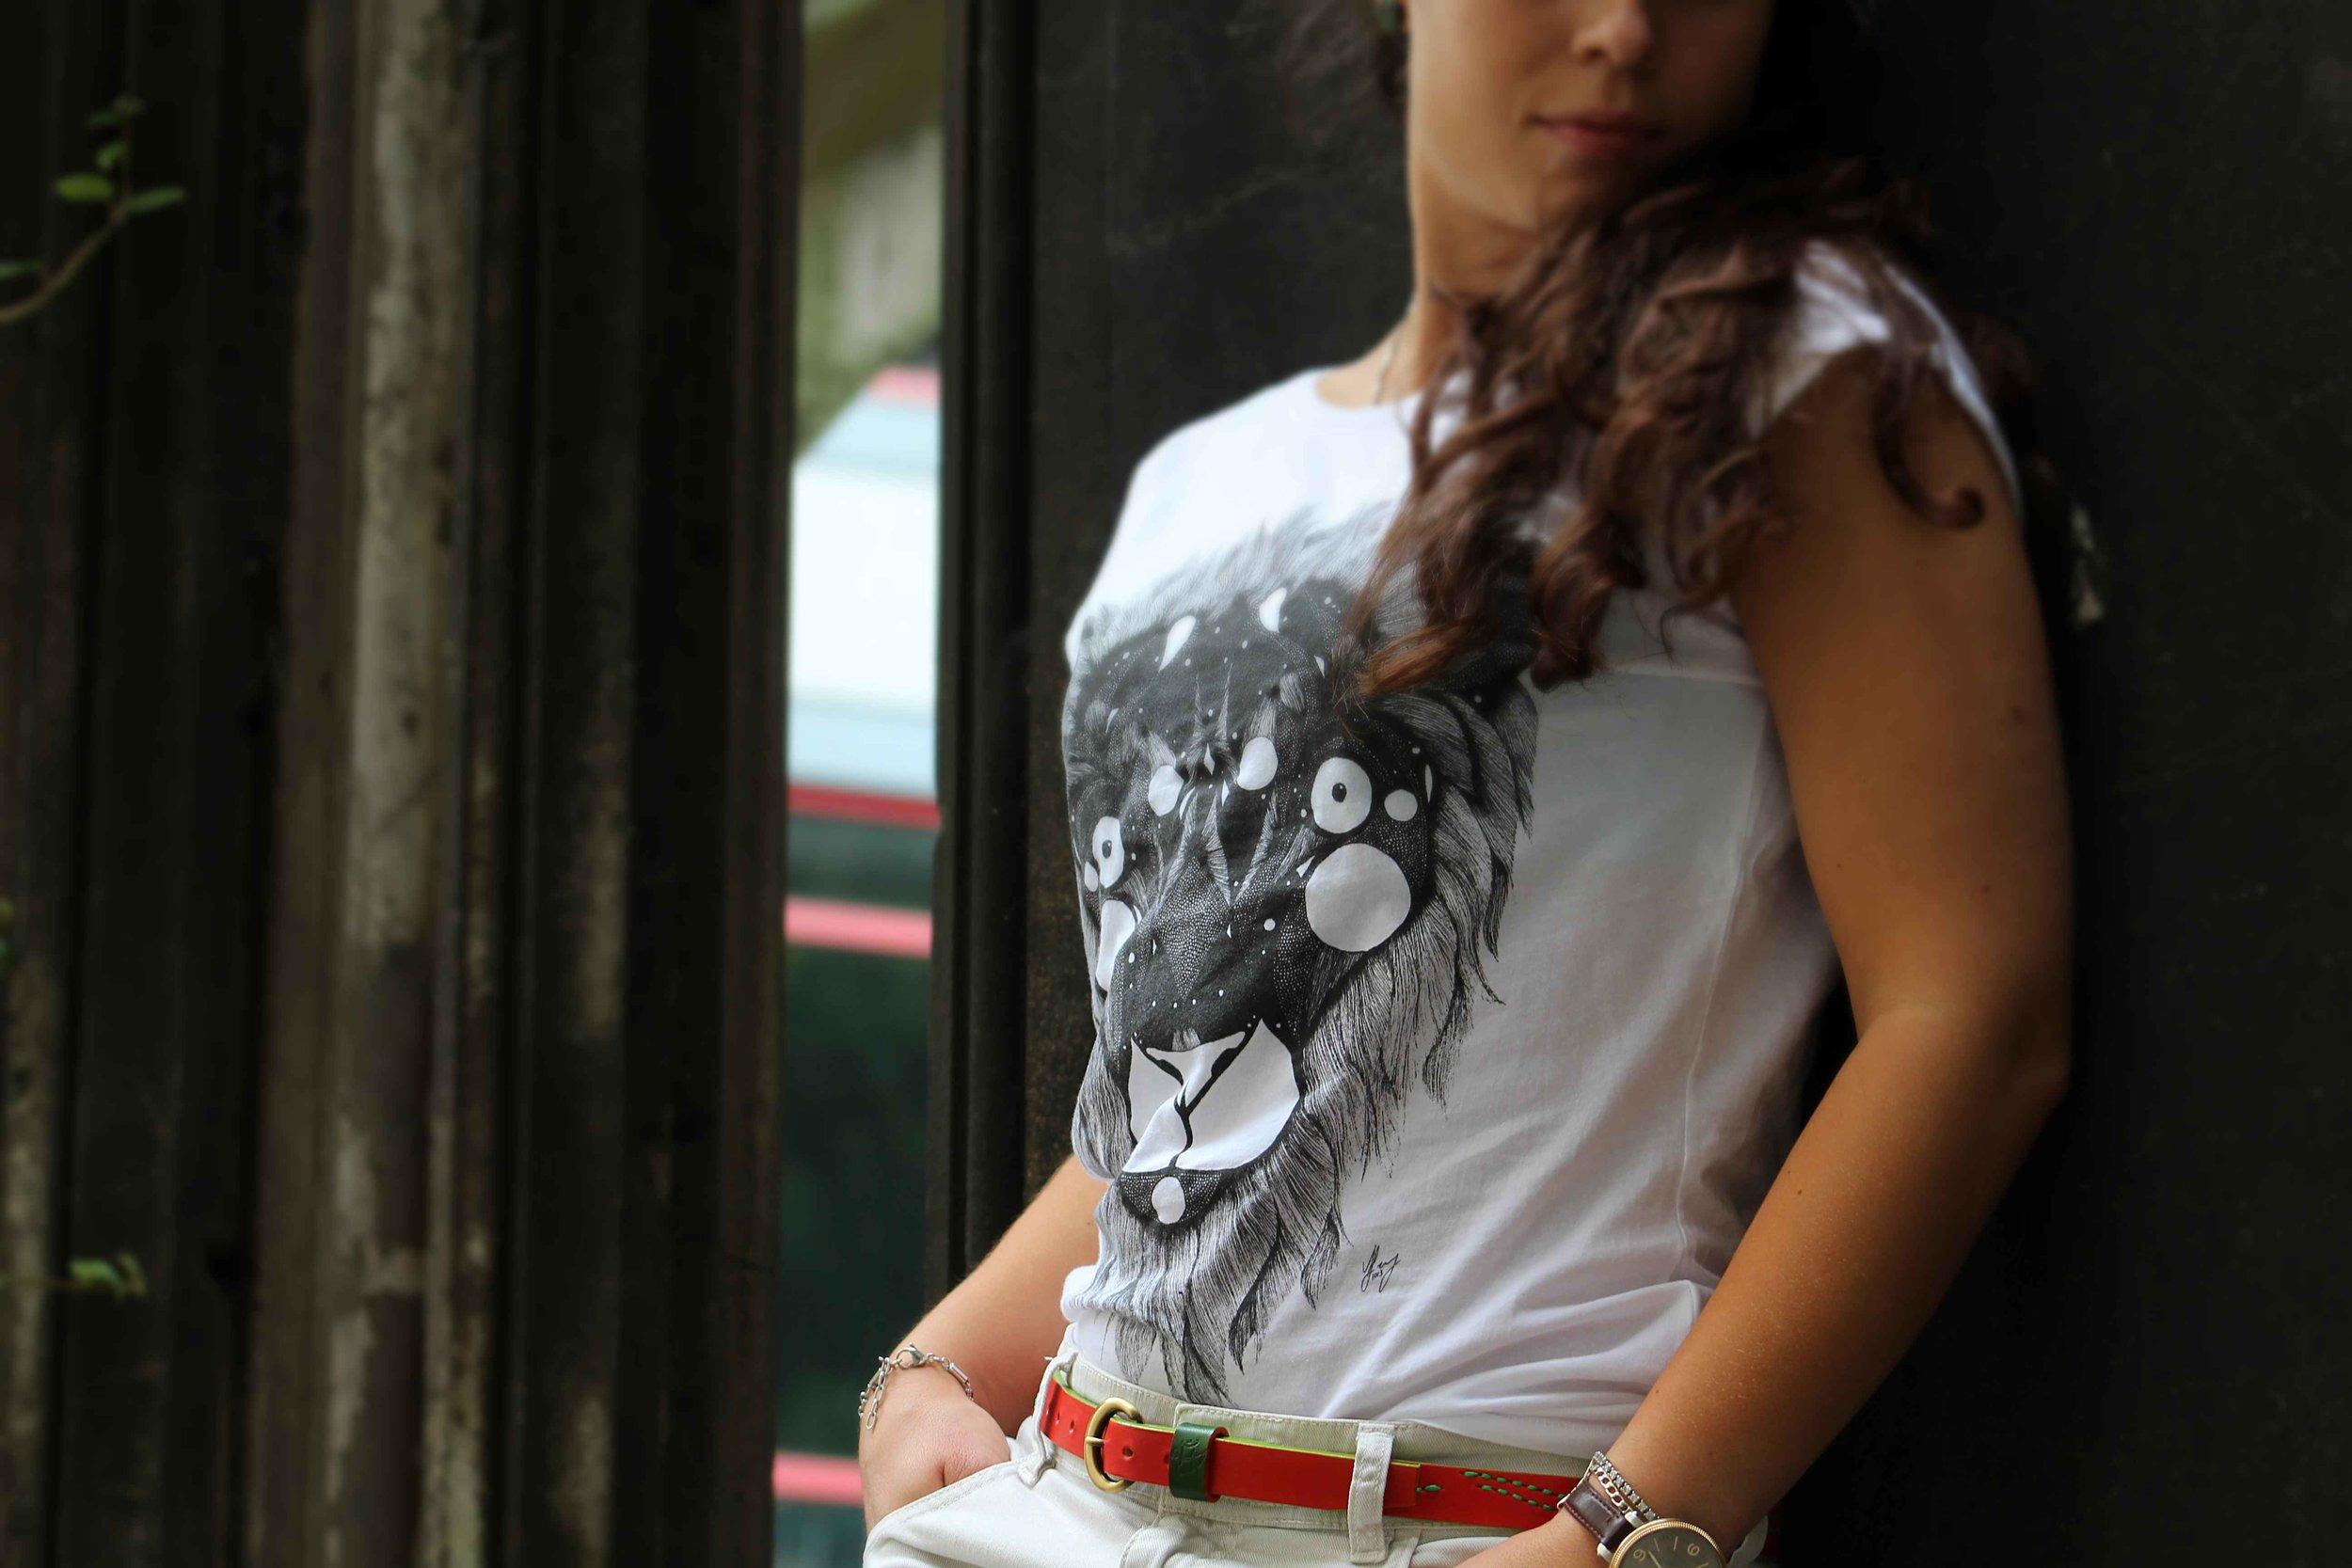 statusquoio-cintura-belt-fatto a mano - handmande - madeinitay - man - woman - London - 3.jpg